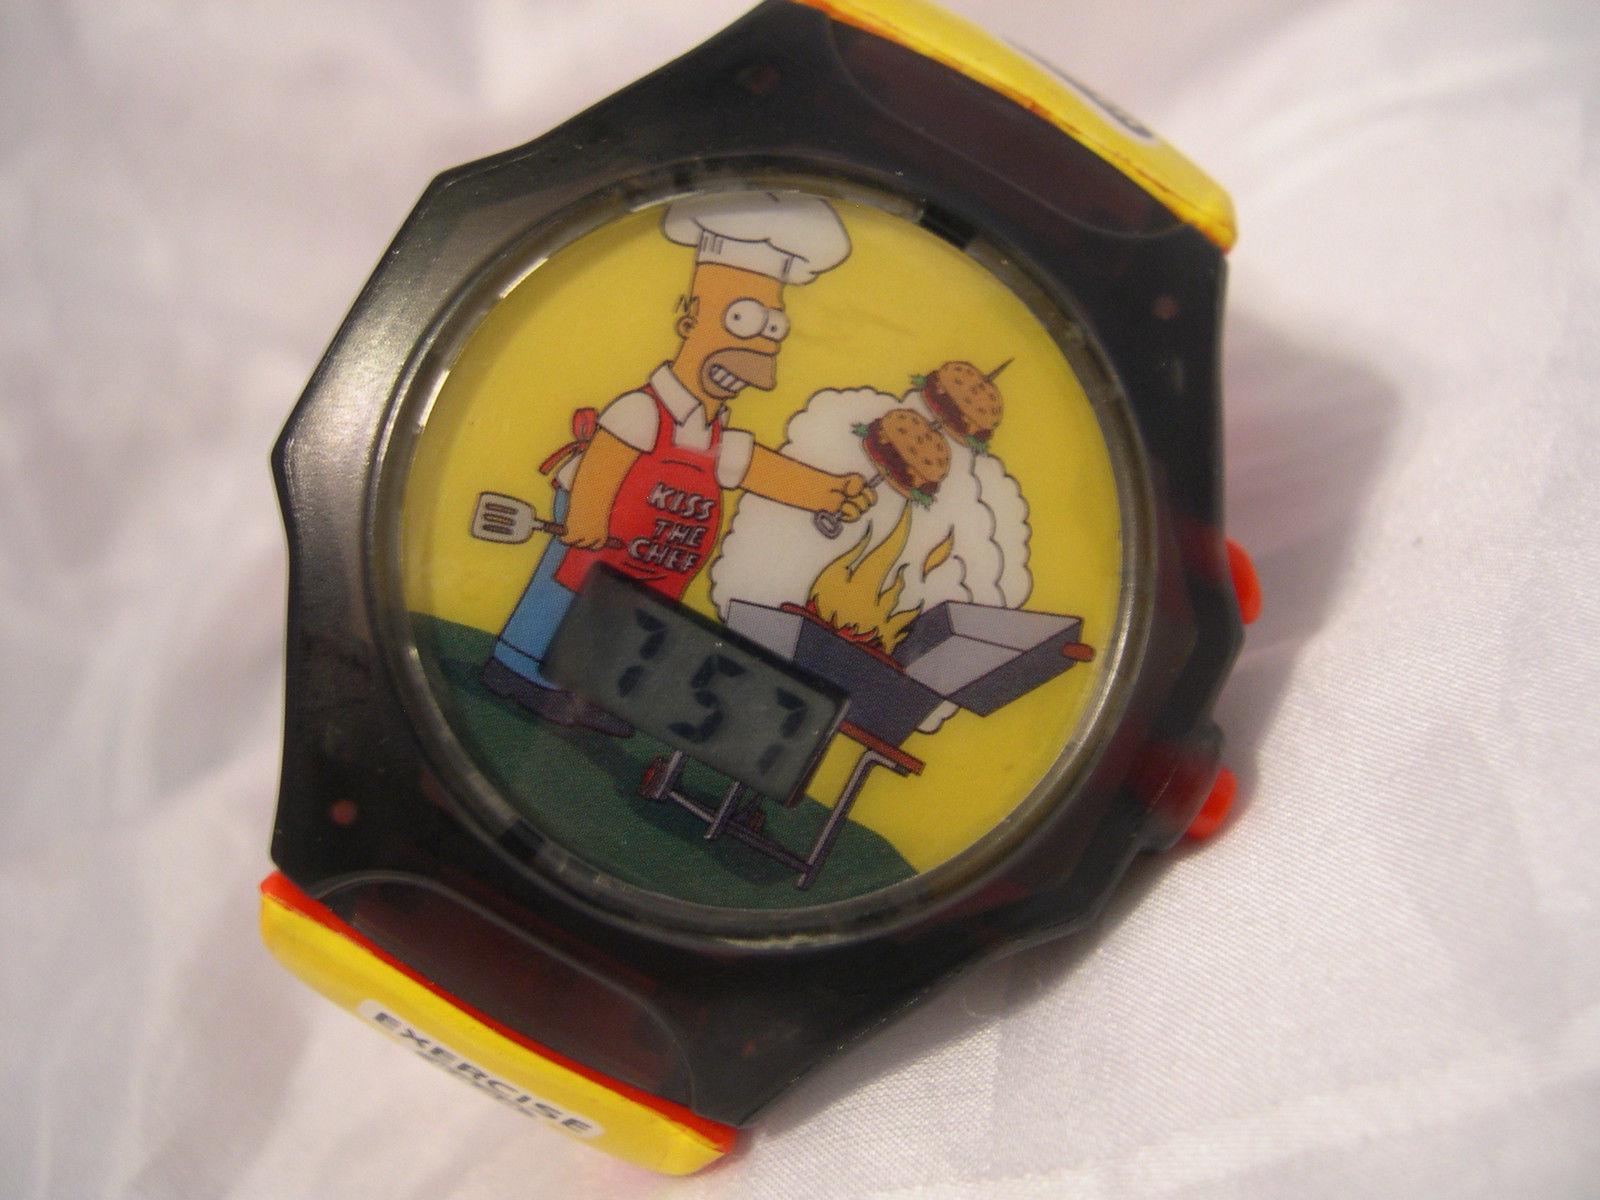 C10, 2003 The Simpsons, Burger Curl Watch, Talks,  Burger King #428 - $4.99